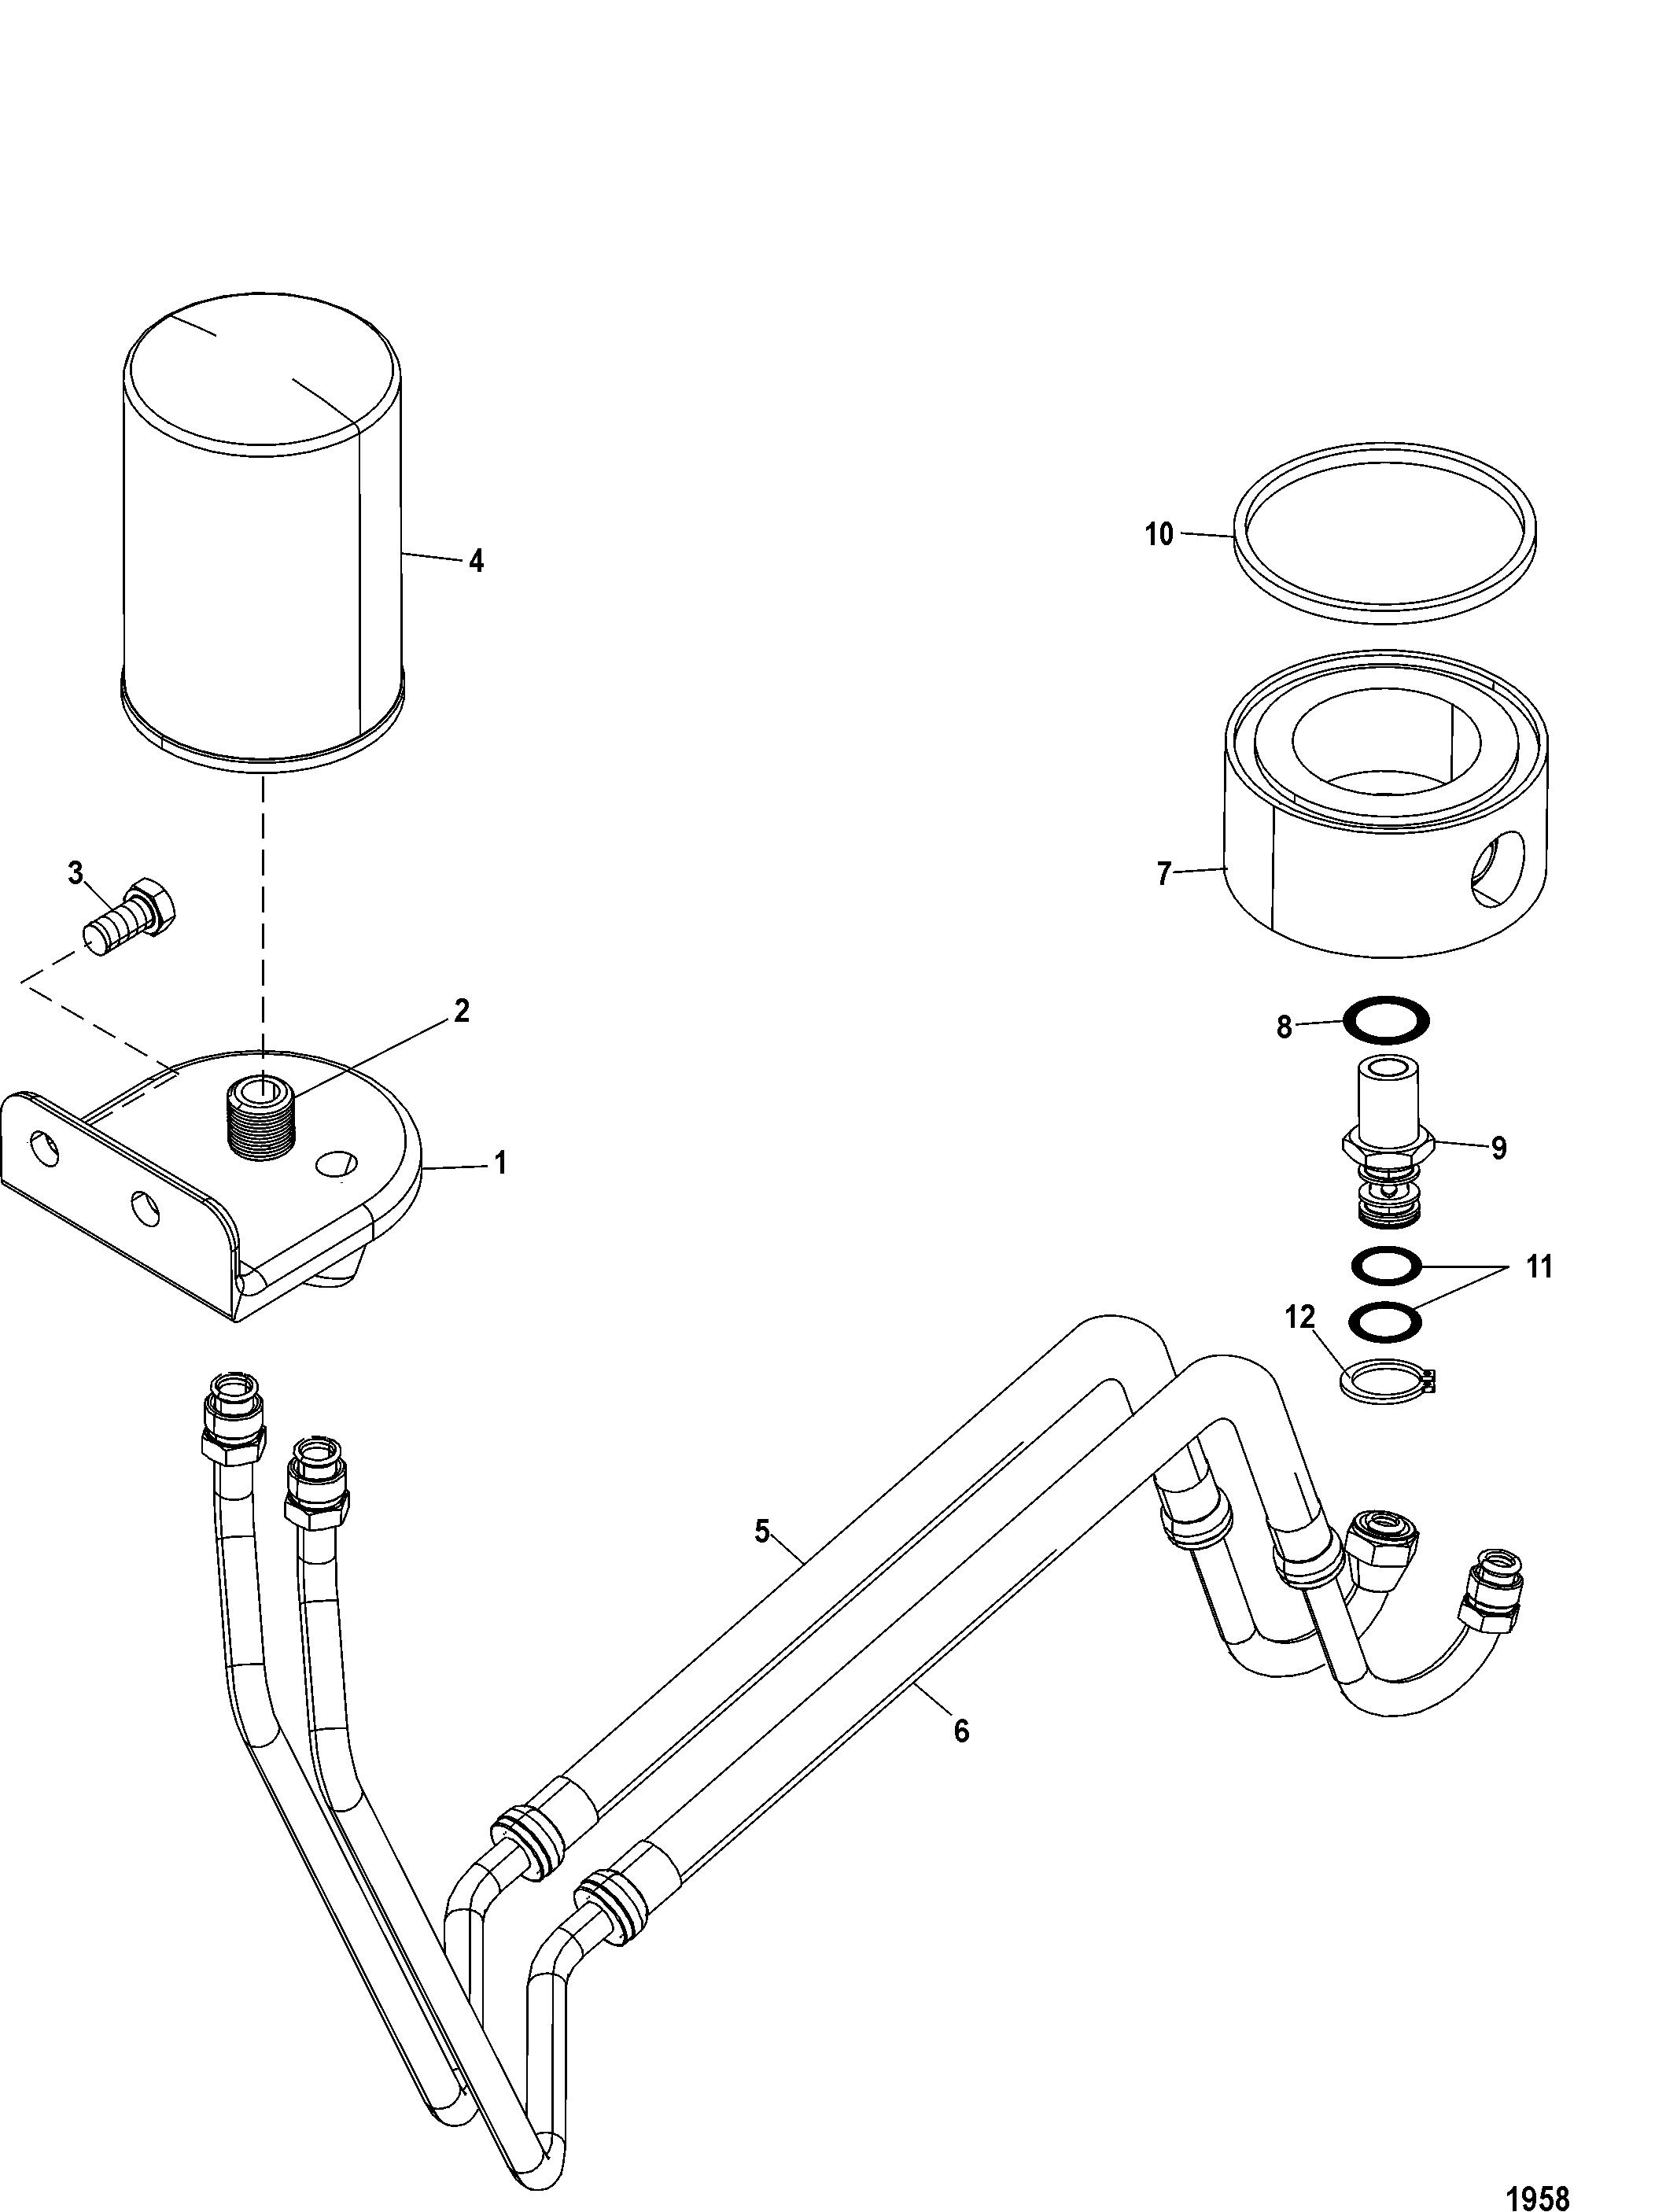 Remote Oil Filter Kit 864990A 2 FOR FUEL/OIL TANKS, LINES